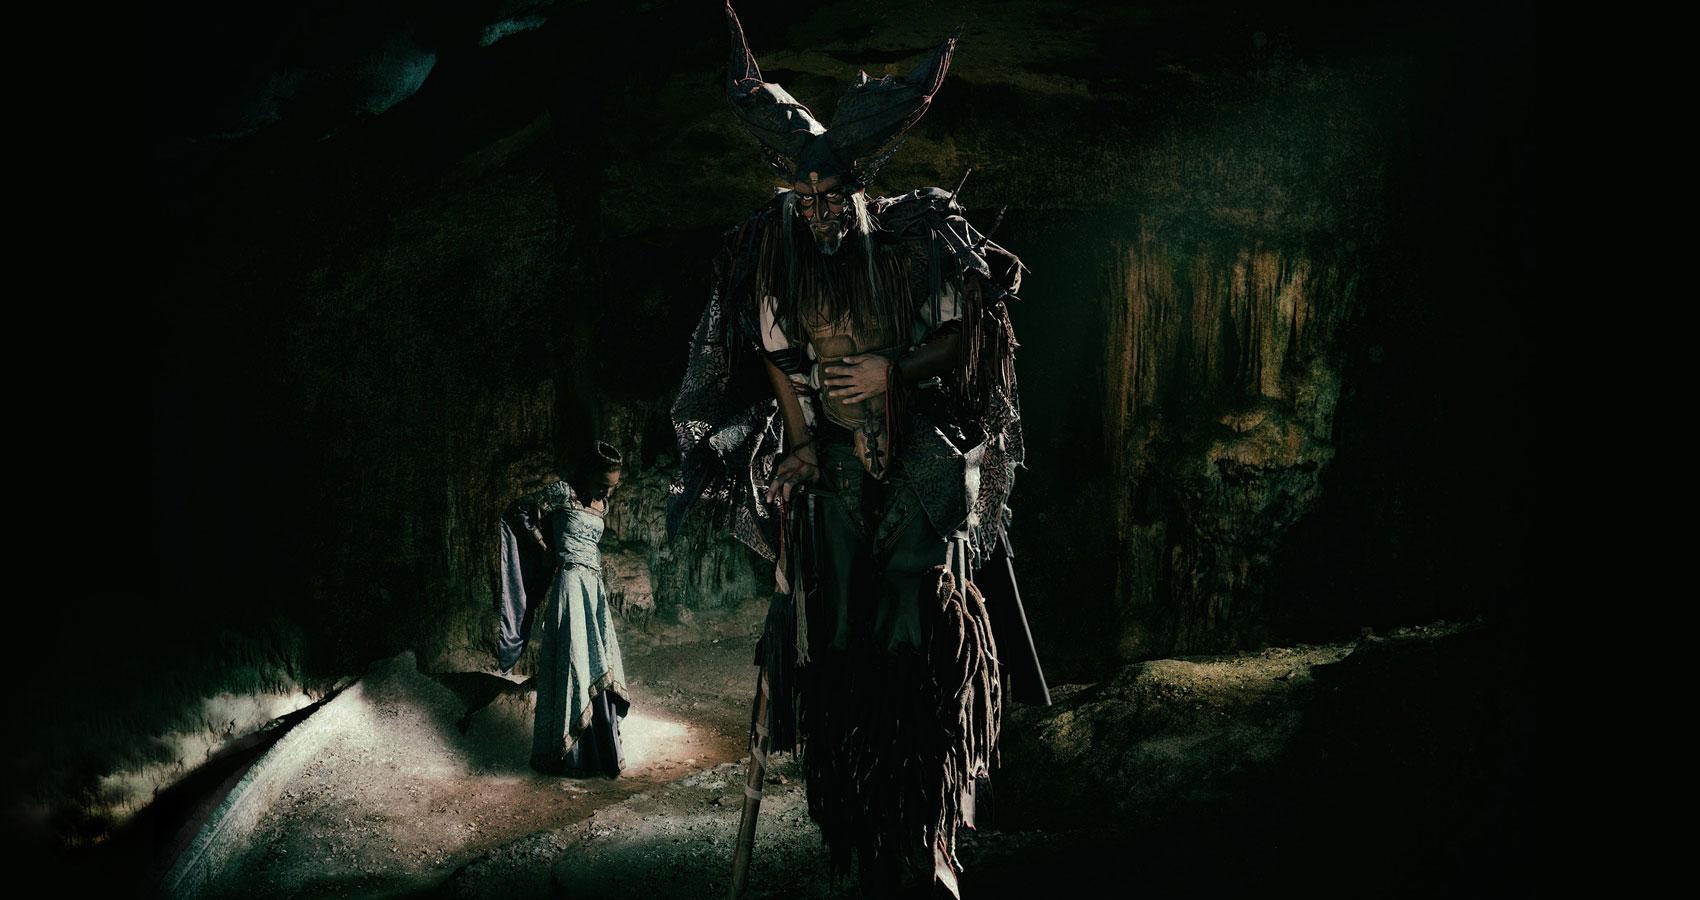 Mephisto, dark poetry written by Fallen Engel at Spillwords.com